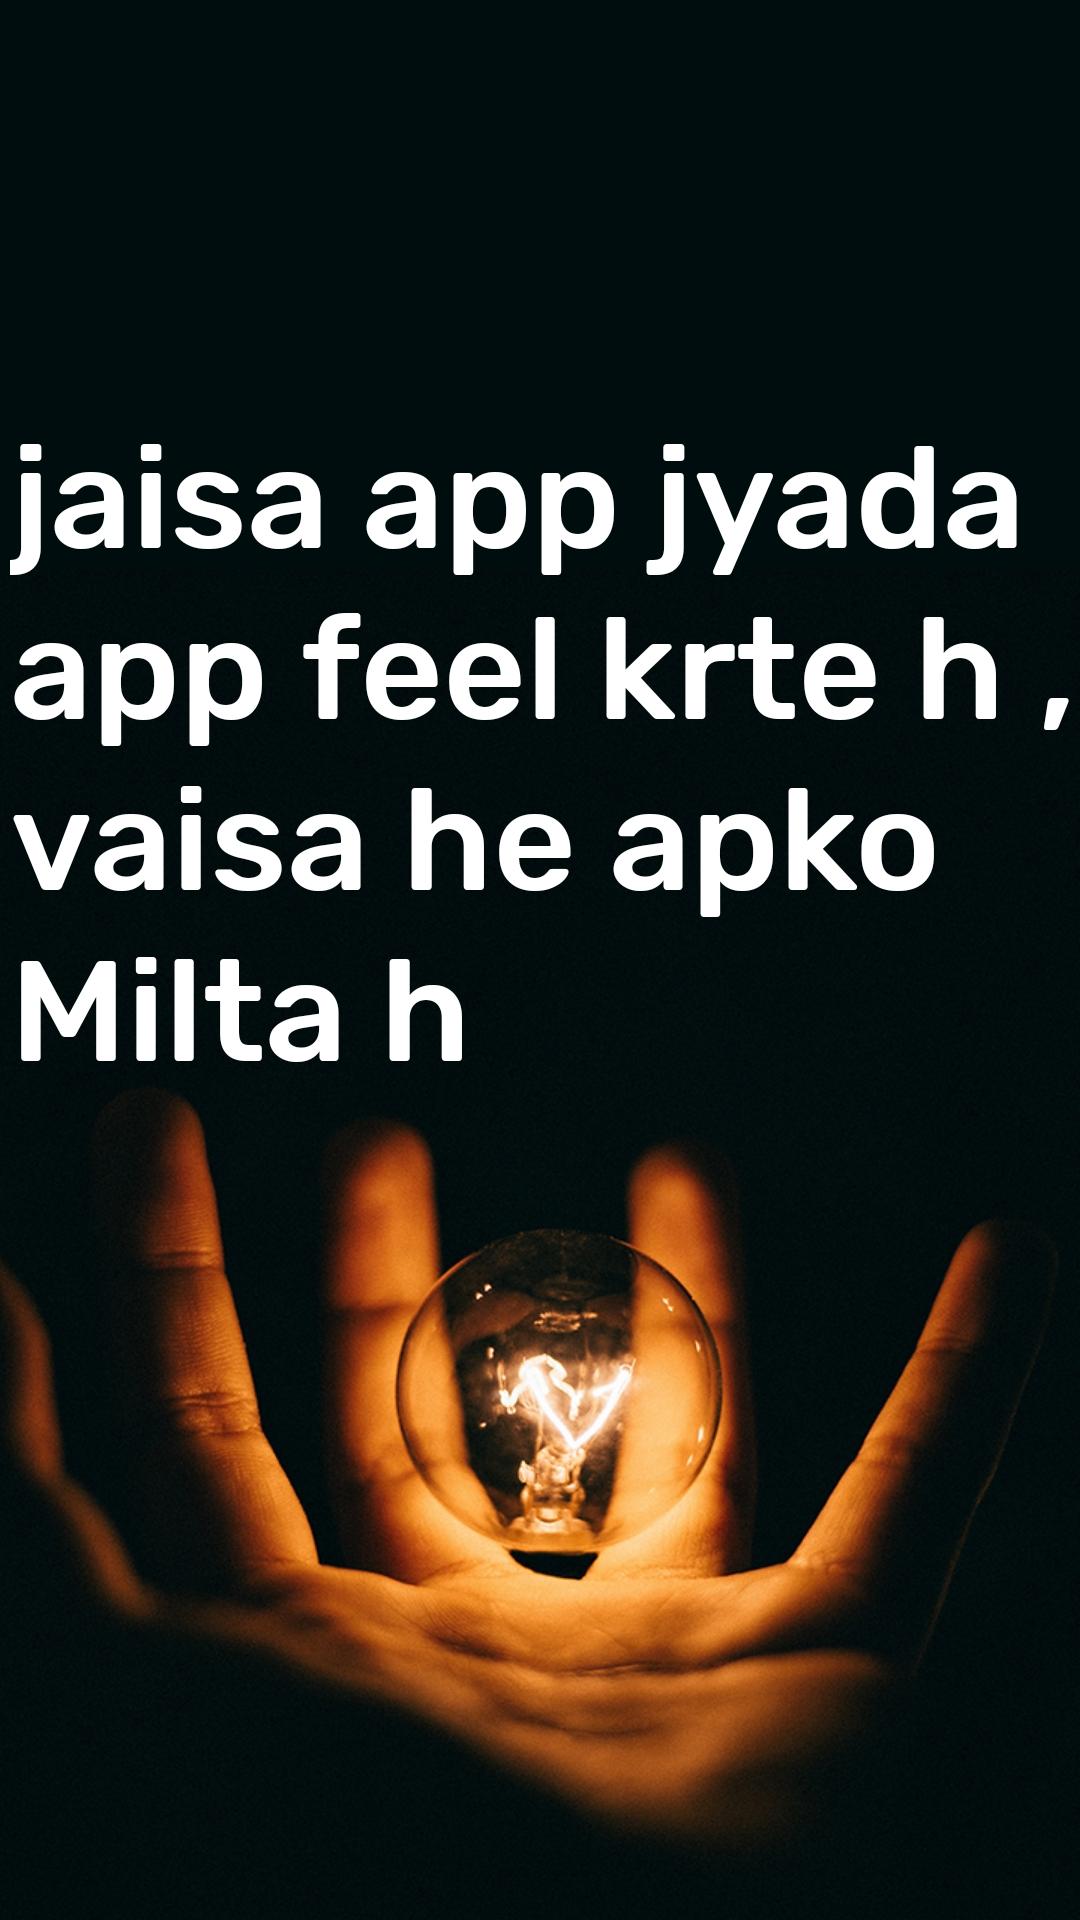 jaisa app jyada app feel krte h , vaisa he apko Milta h